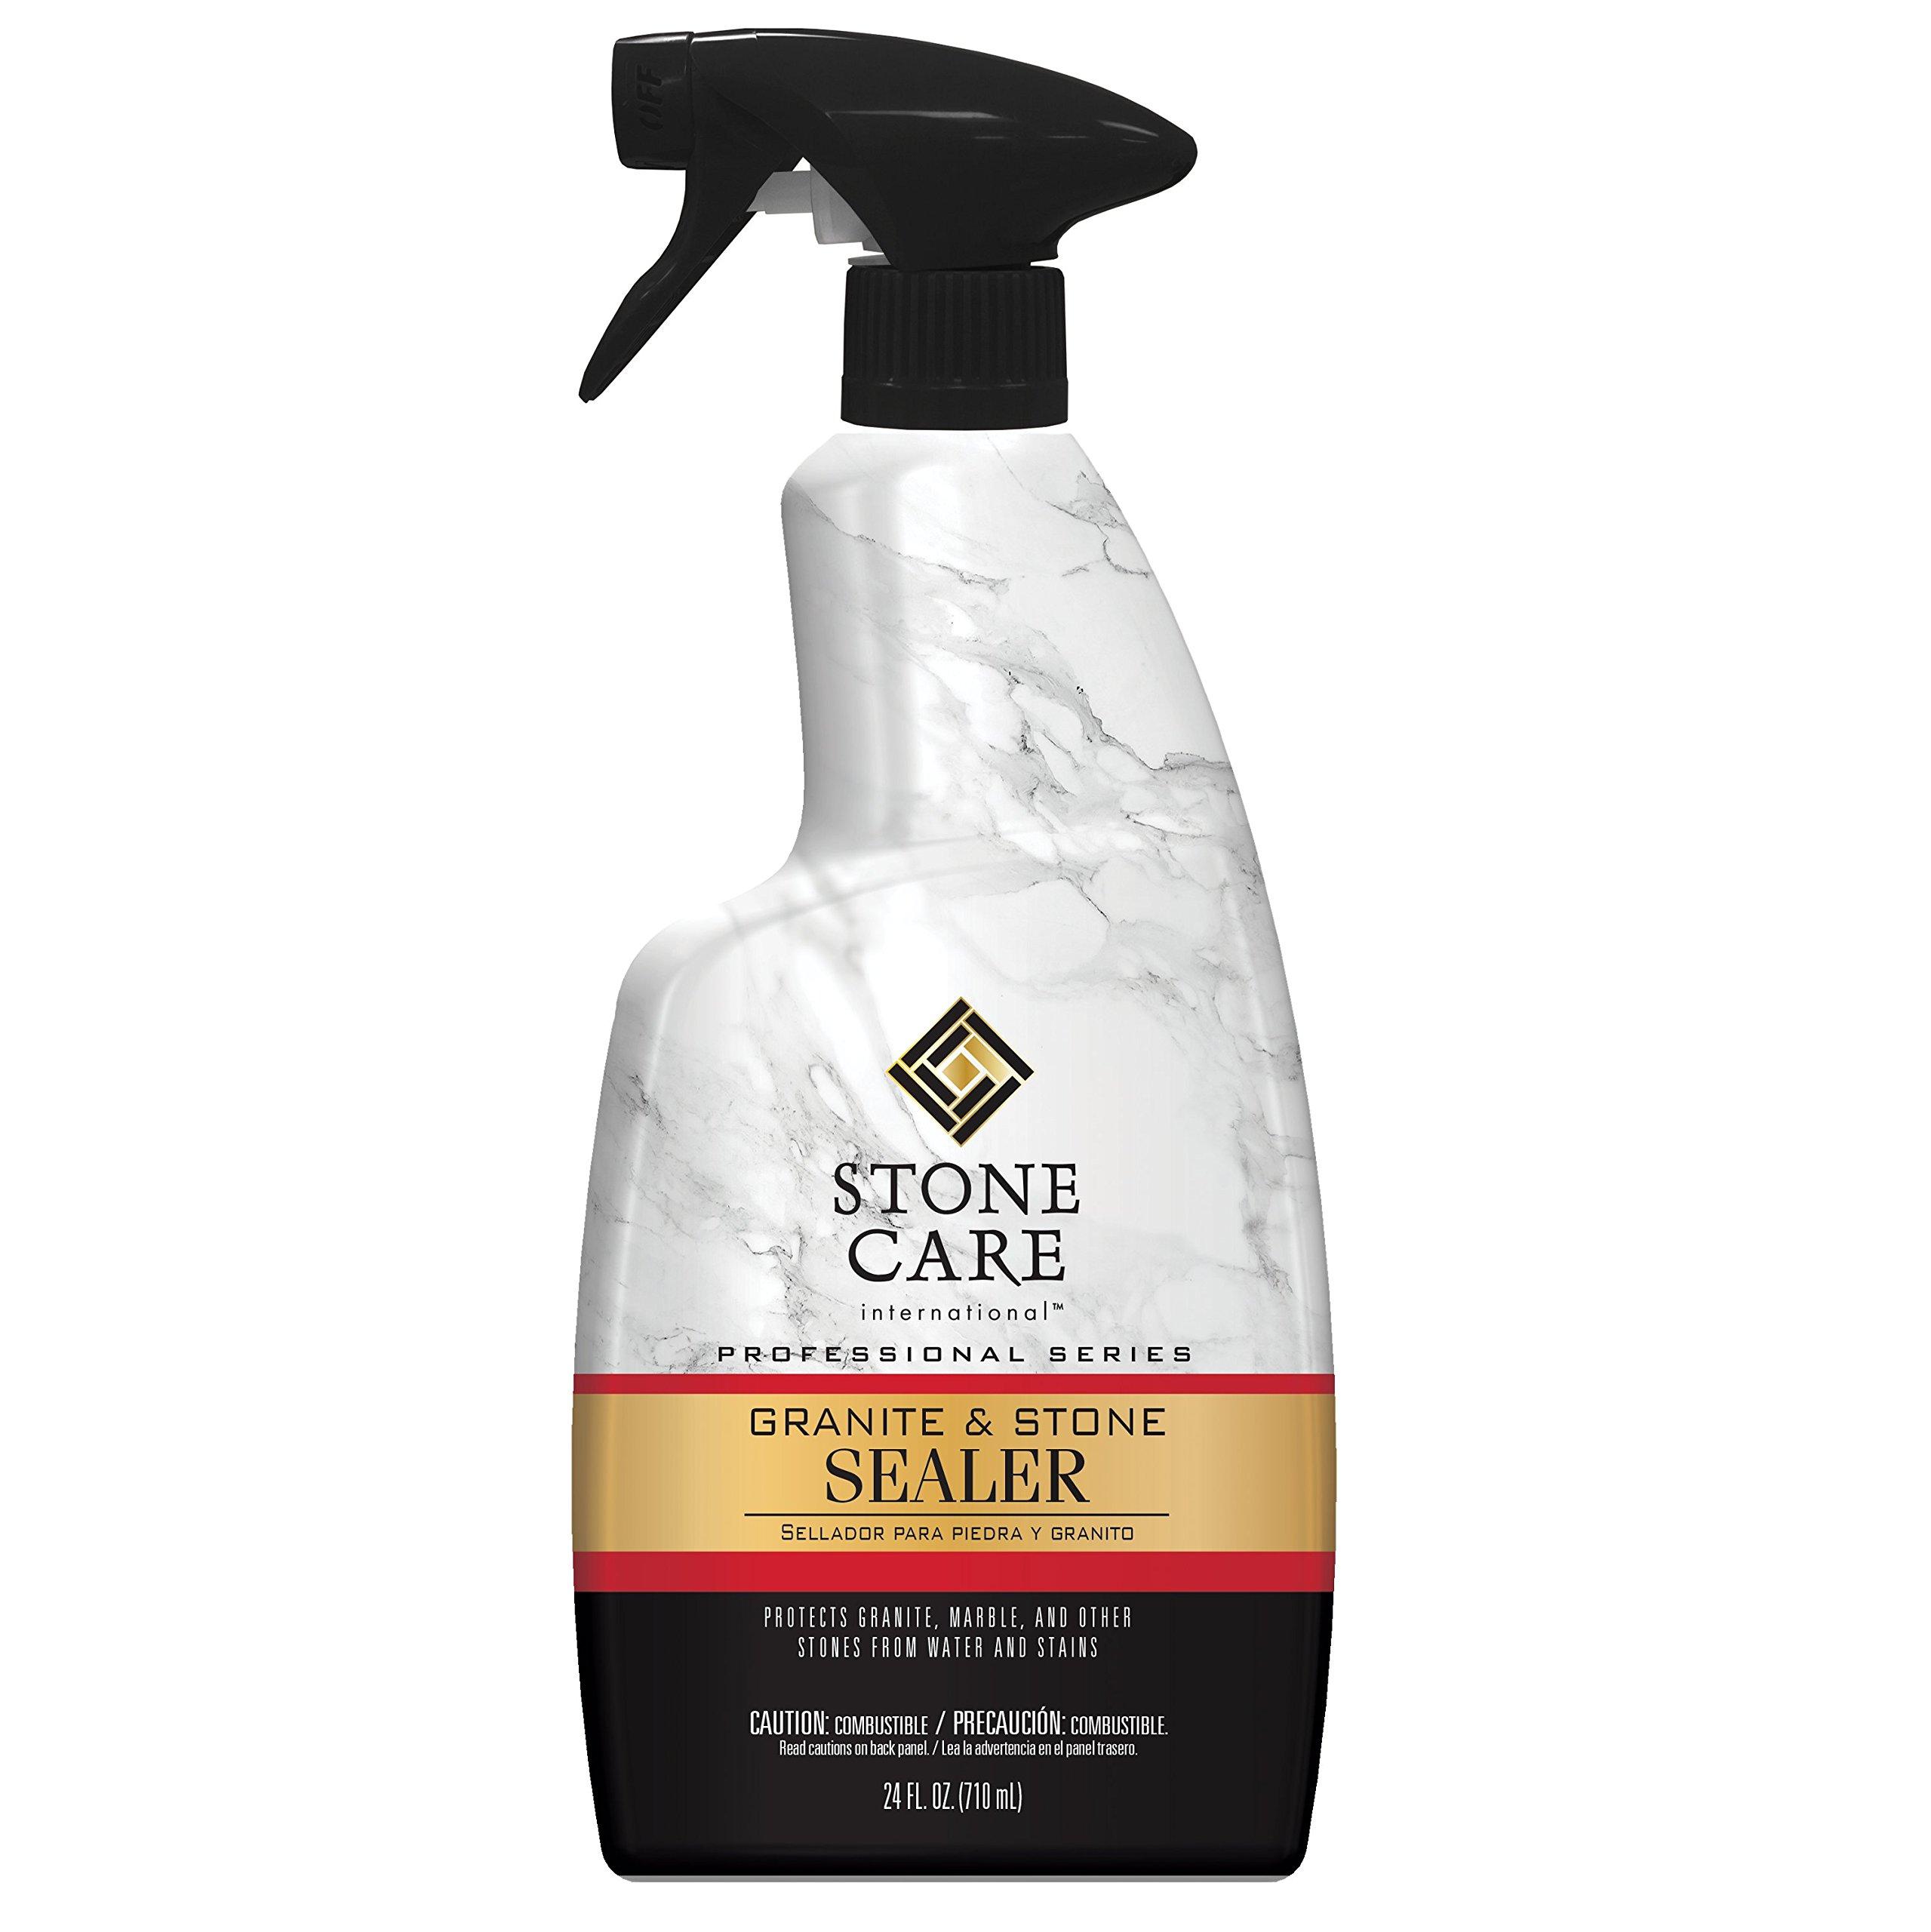 Stone Care International Granite & Stone Sealer Spray, 24 fl oz